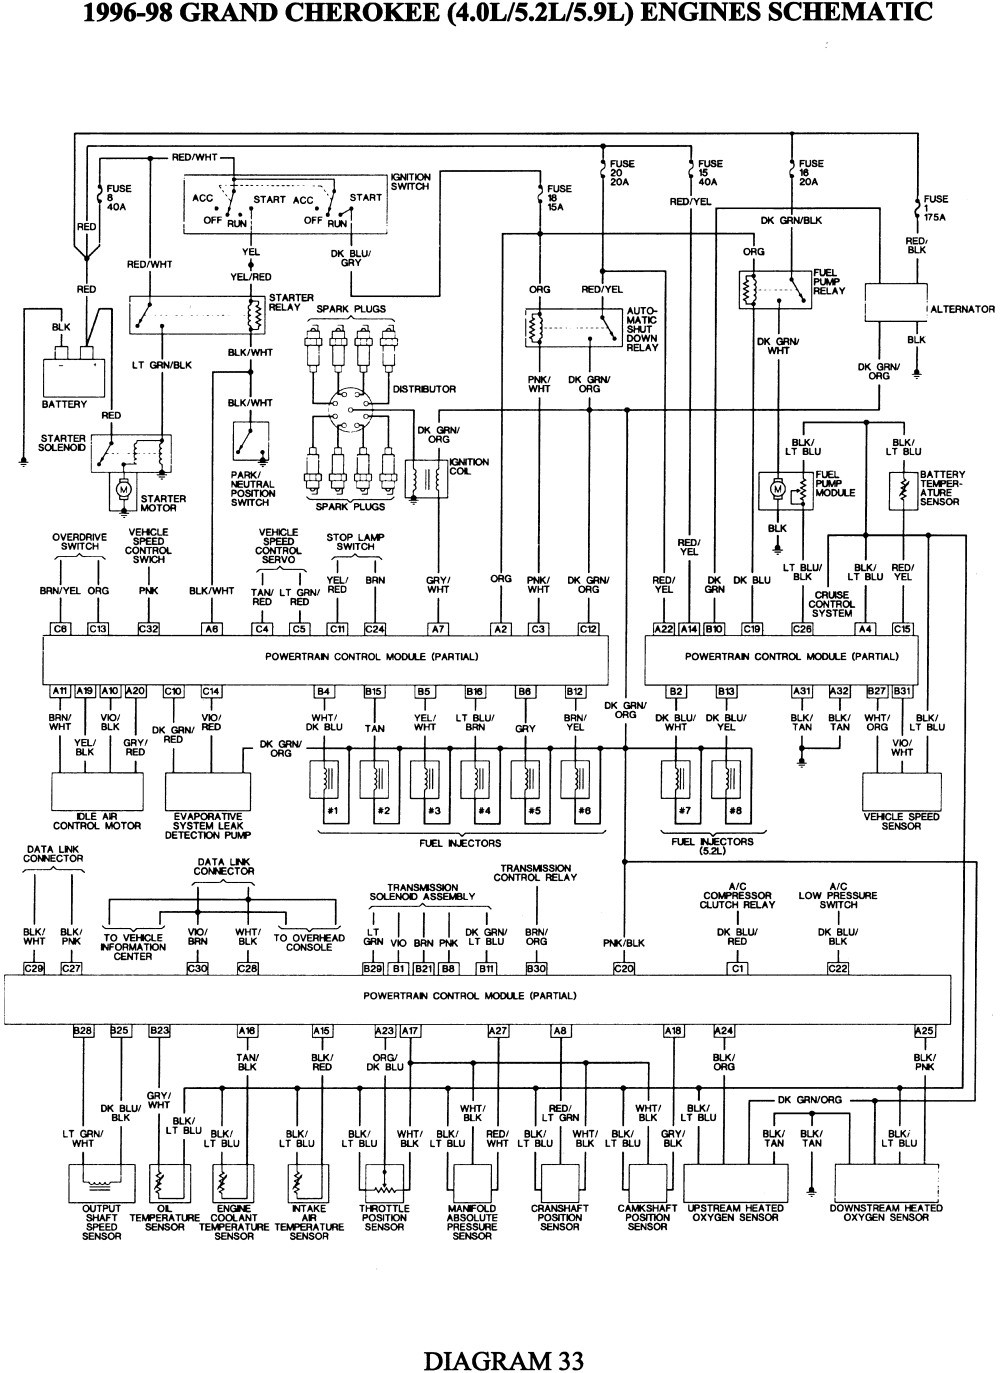 2000 Jeep Grand Cherokee Radio Wiring Diagram Best Jeep Radio Wiring Diagram at 1997 Wrangler